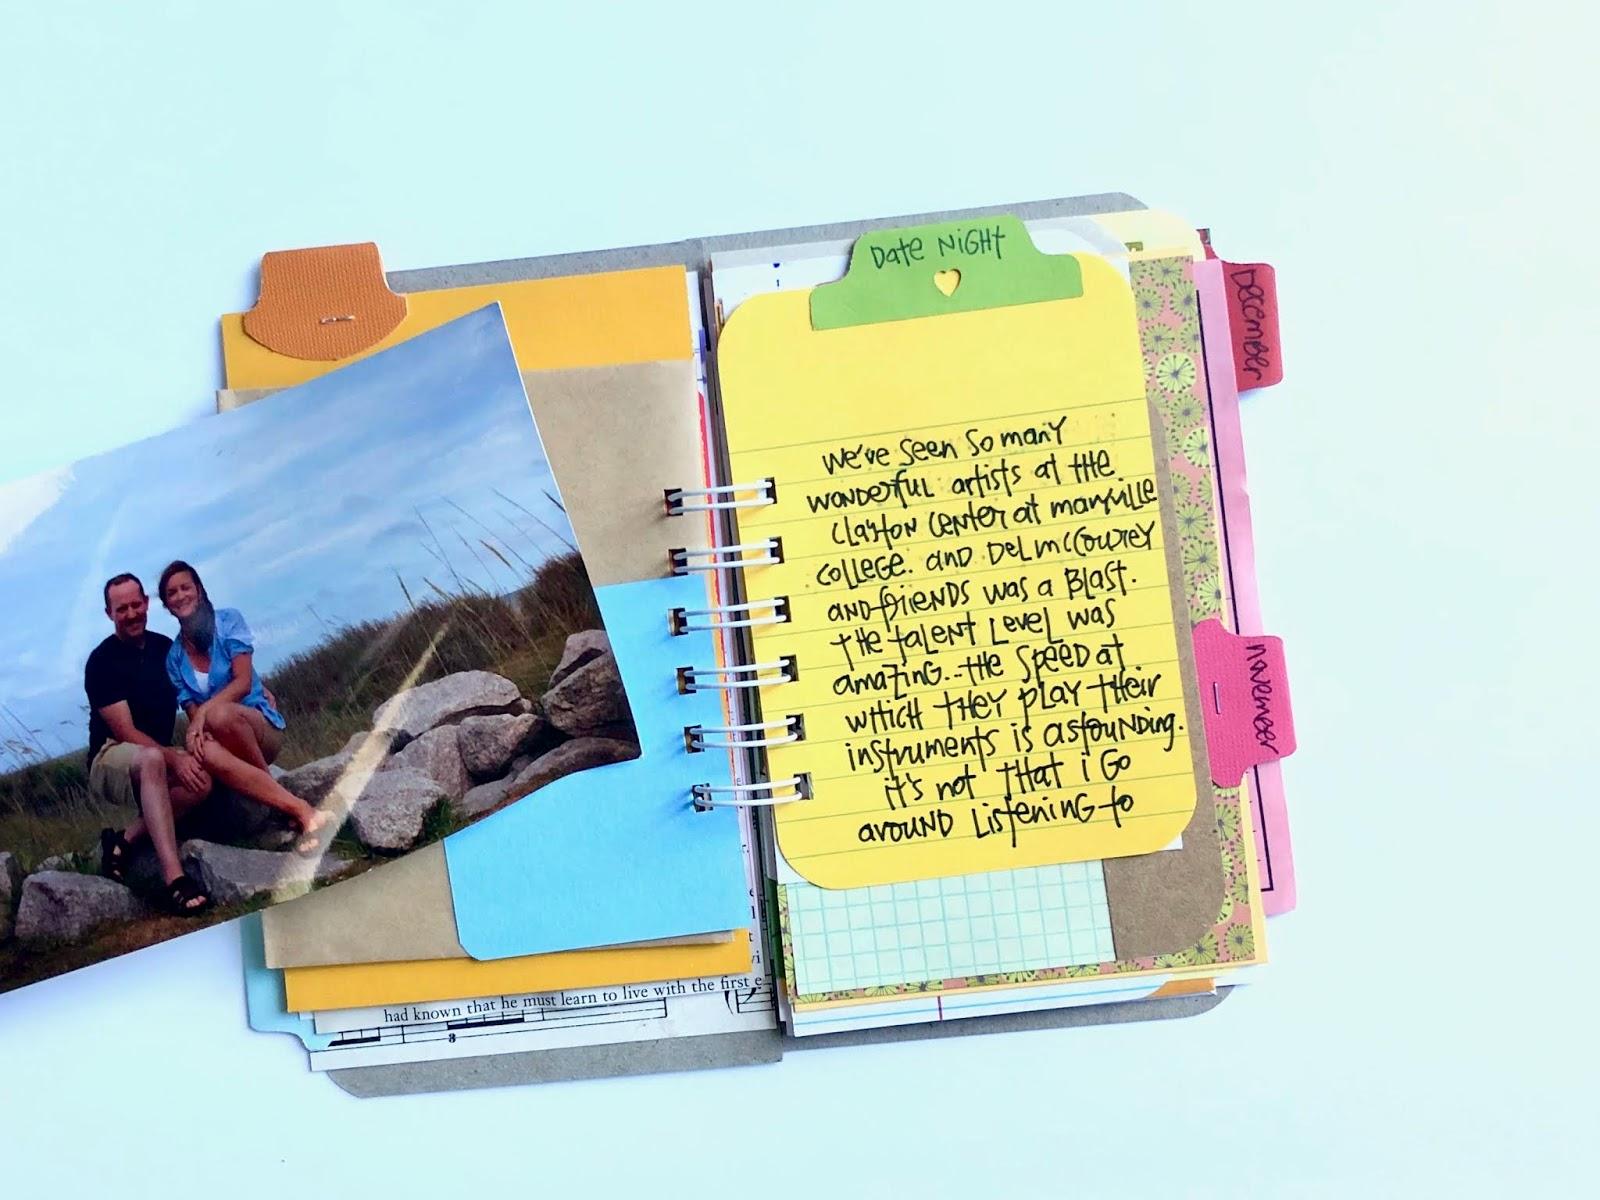 #gratitude #gratitude journal #journaling #Today I Am Grateful For #thankful #thankfulness #I Am Thankful For